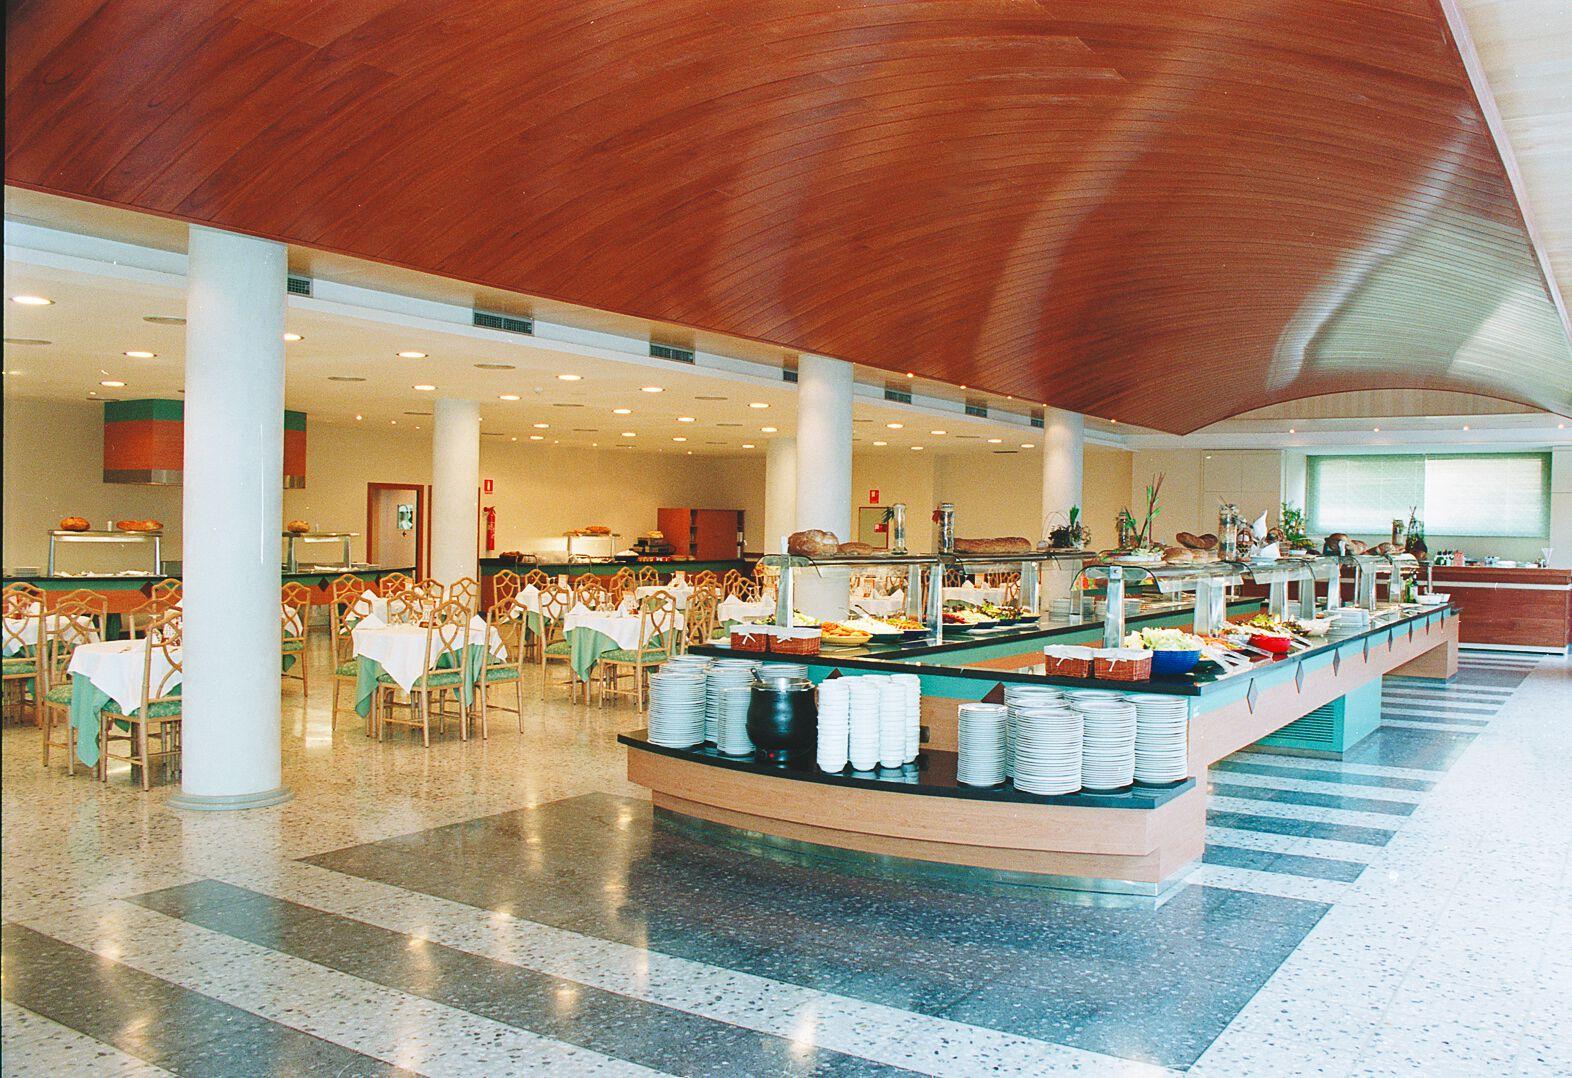 Séjour Espagne - Hotel Alegria Caprici Verd - 4*